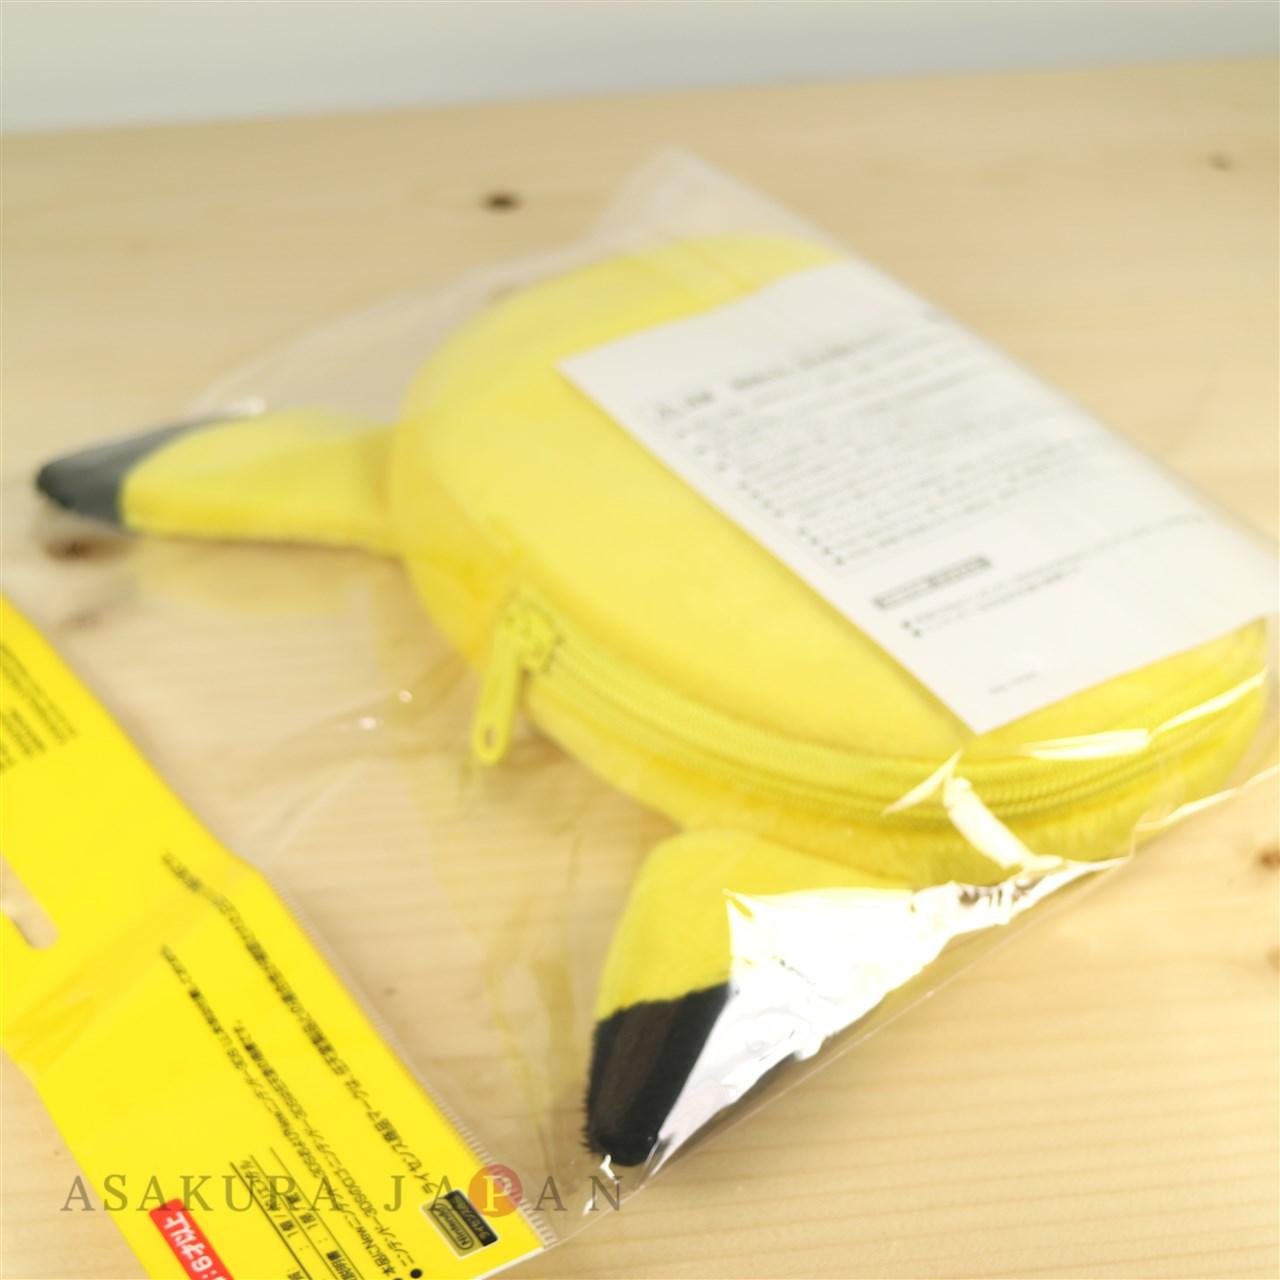 New Nintendo 3ds Ll Xl Stuffed Plush Pouch Case Pikachu Face Pokemon Yellow Edition Center 16112801